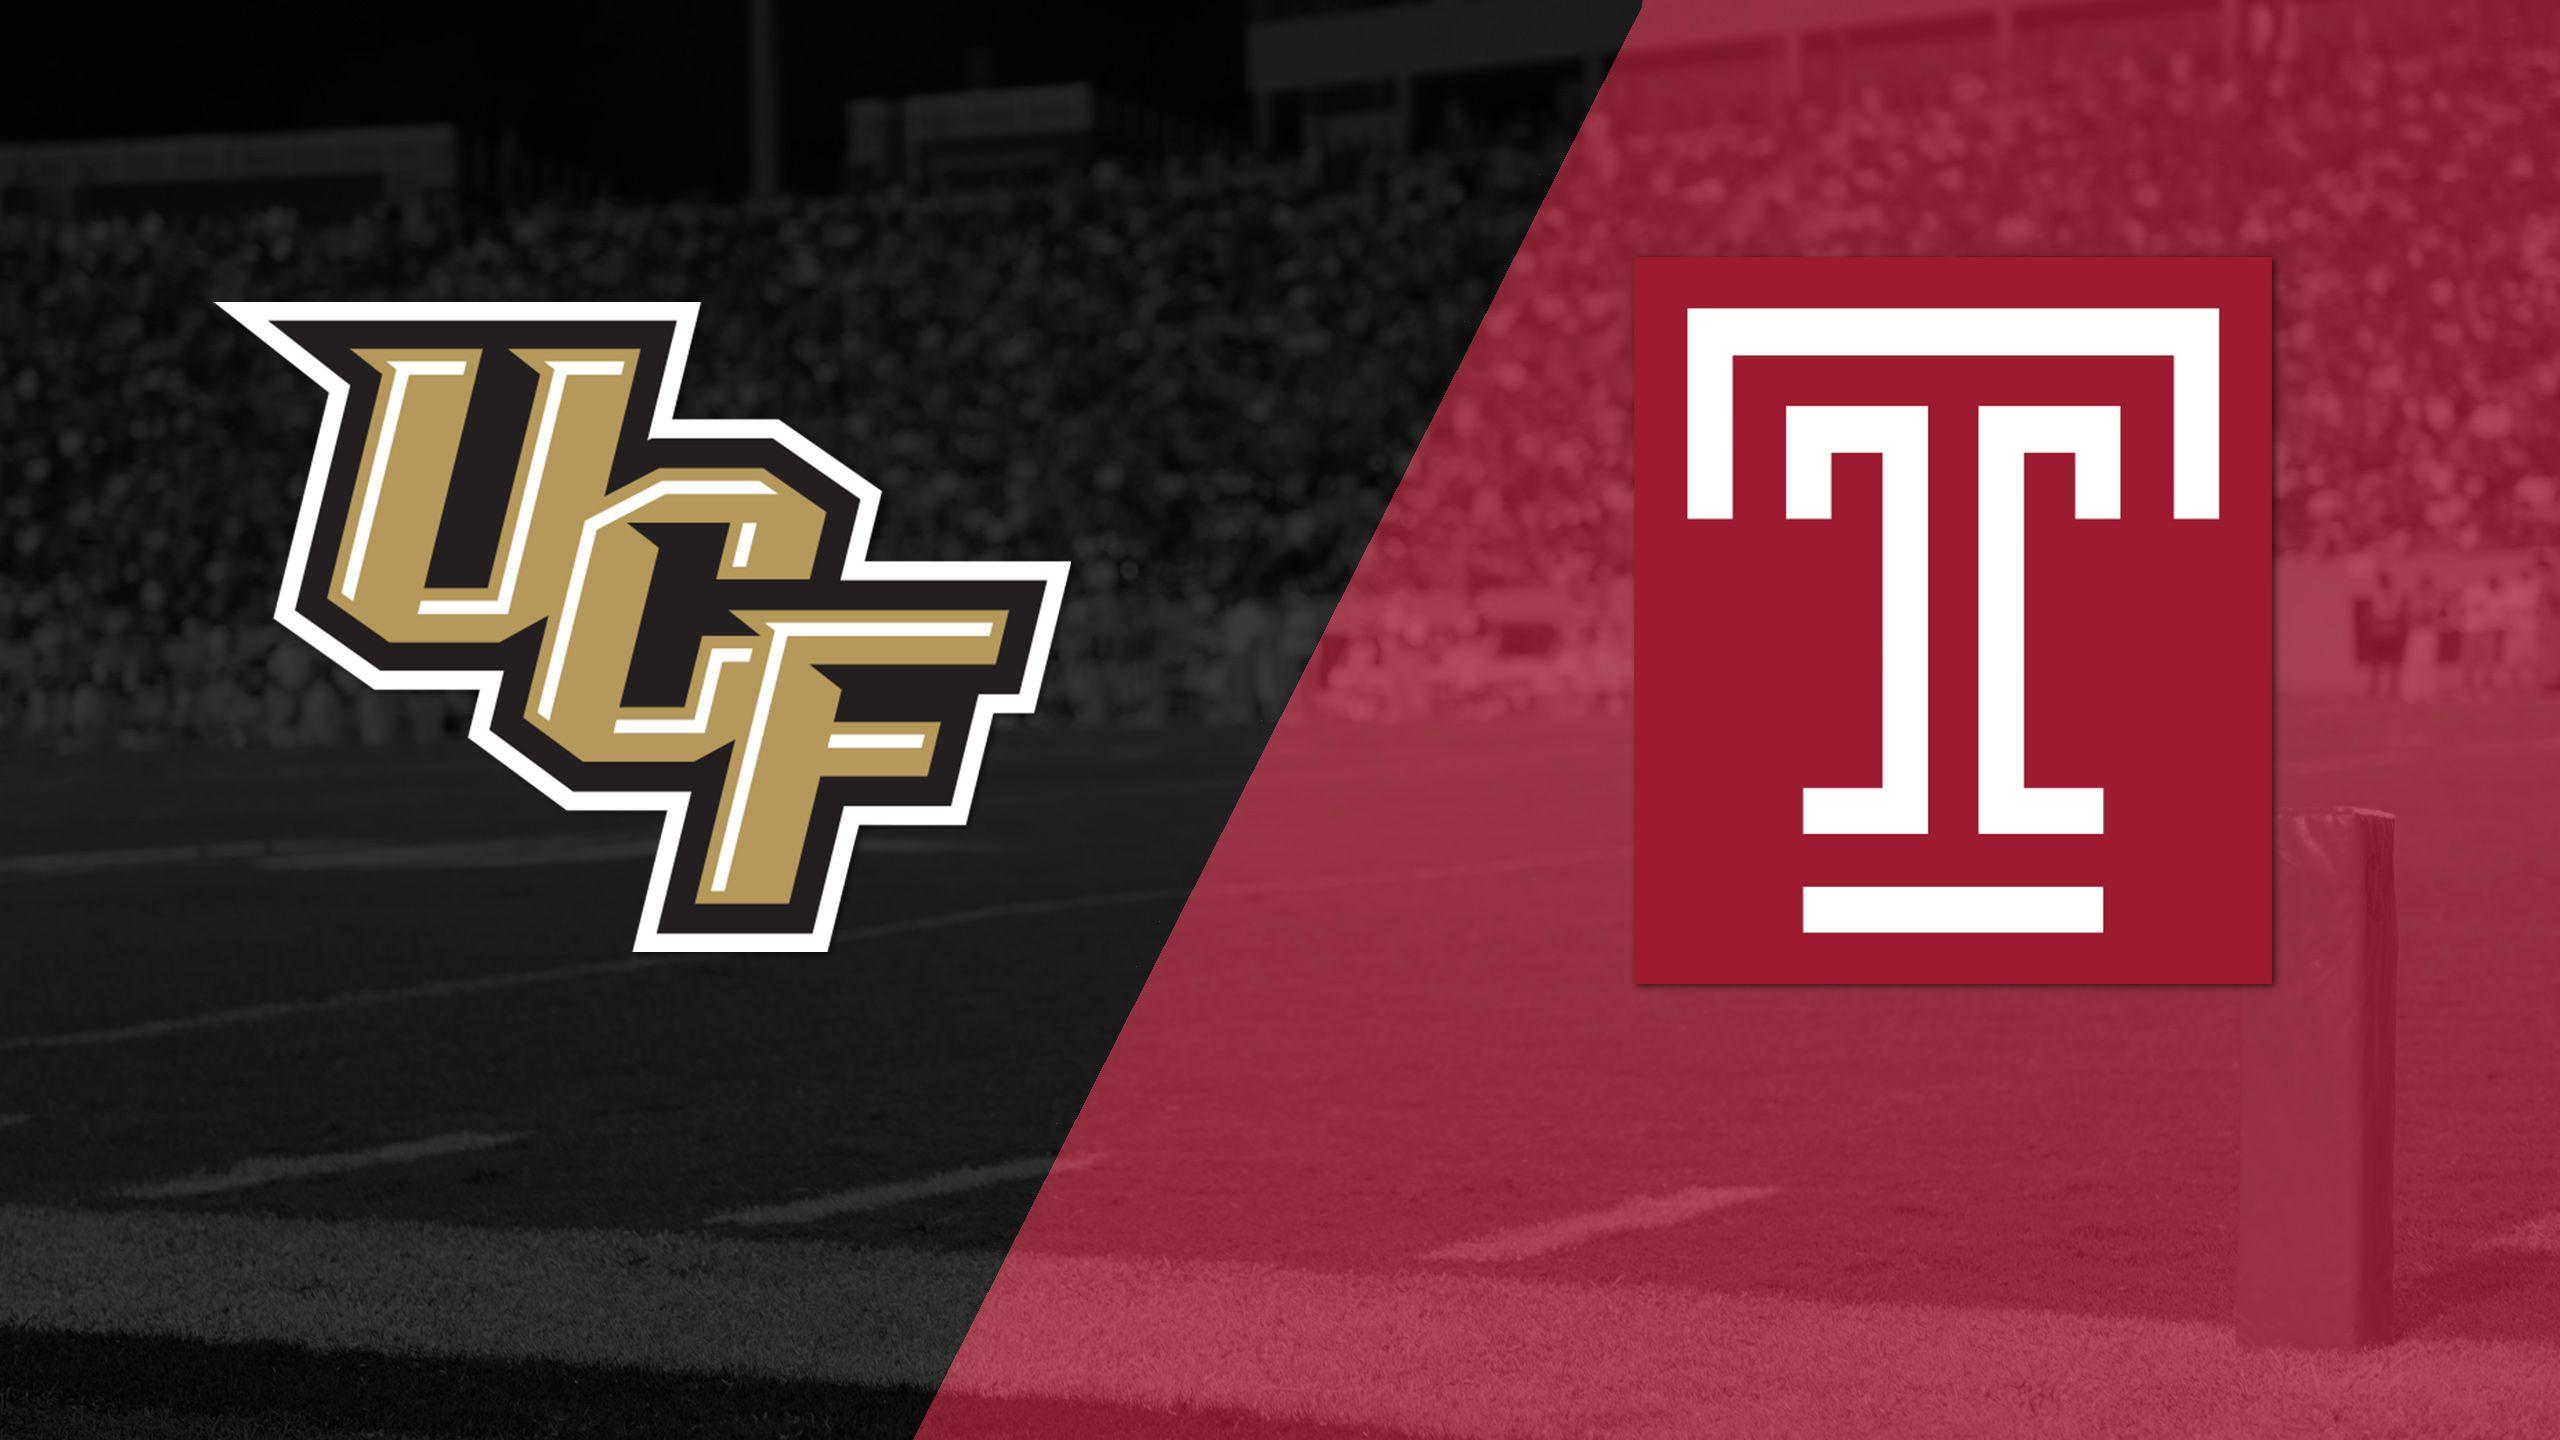 #15 UCF vs. Temple (Football)